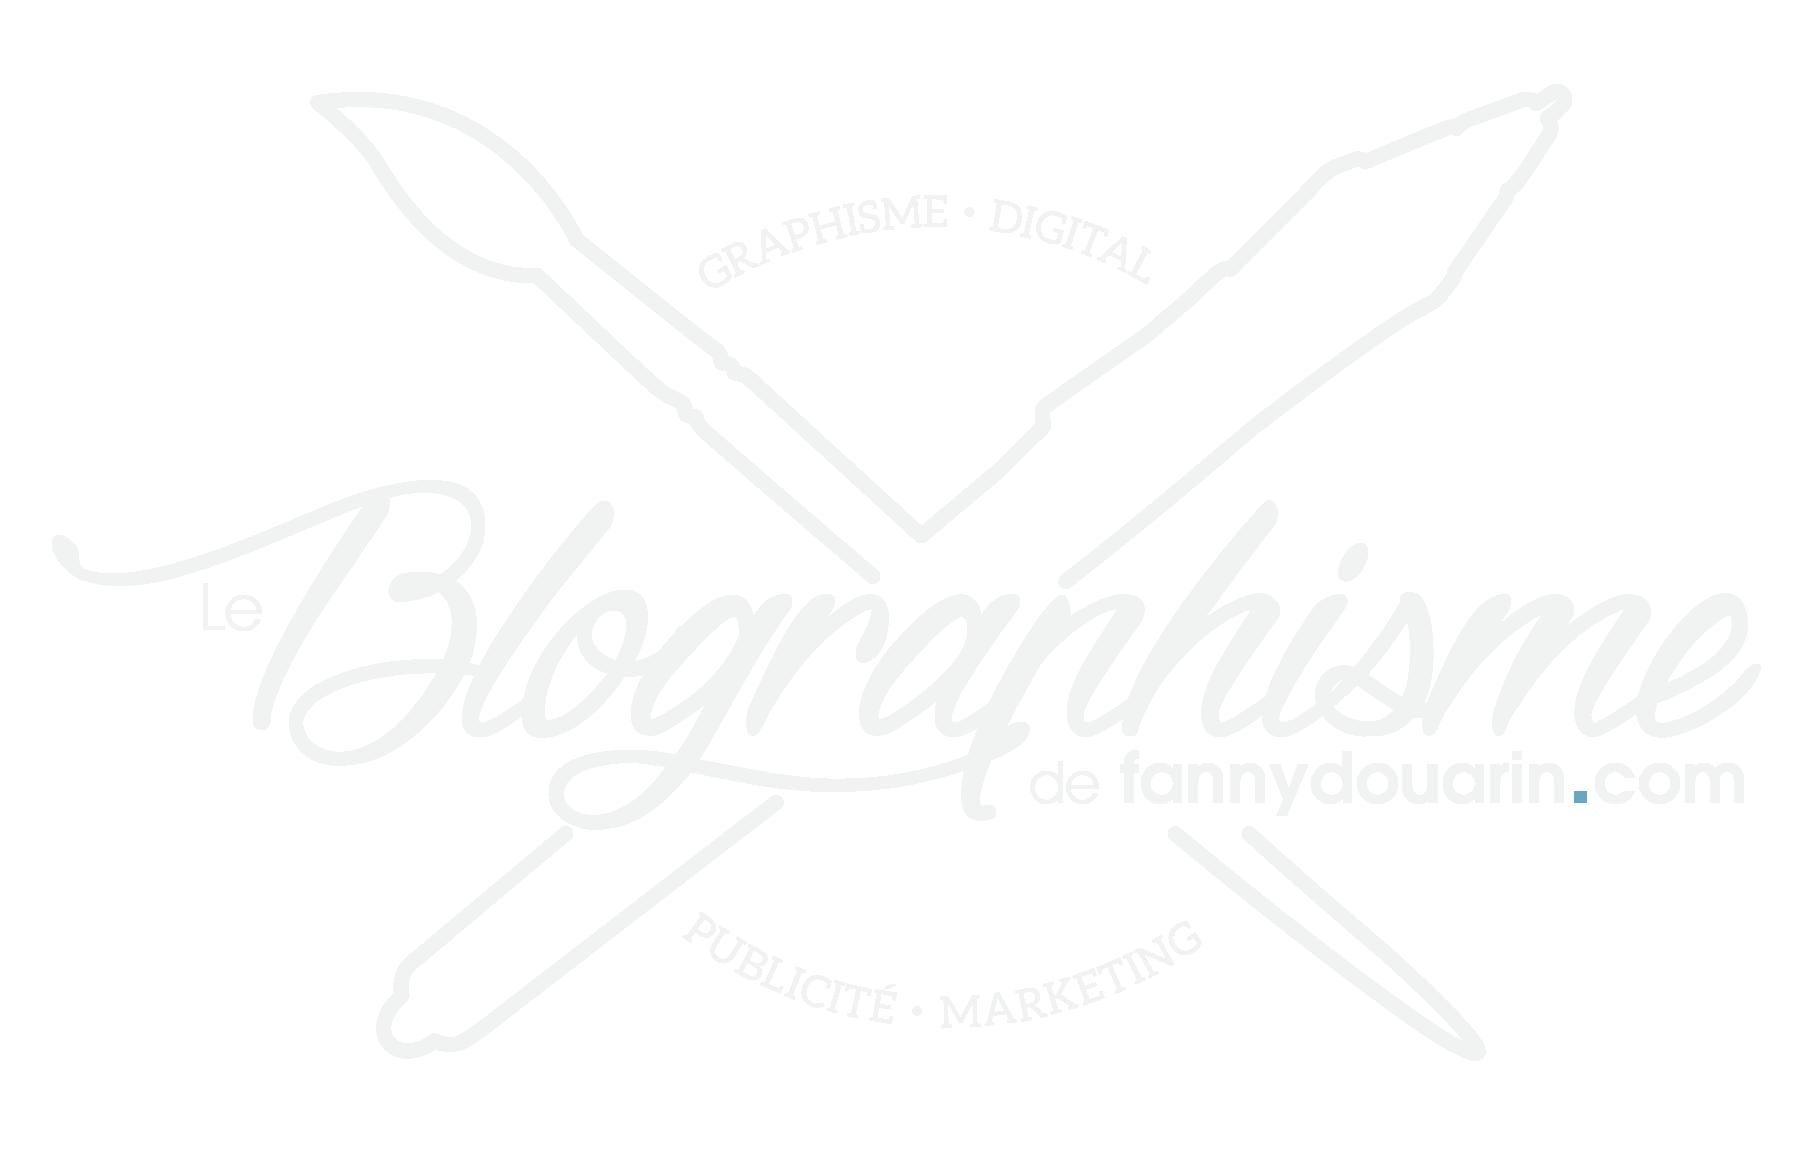 Blographisme